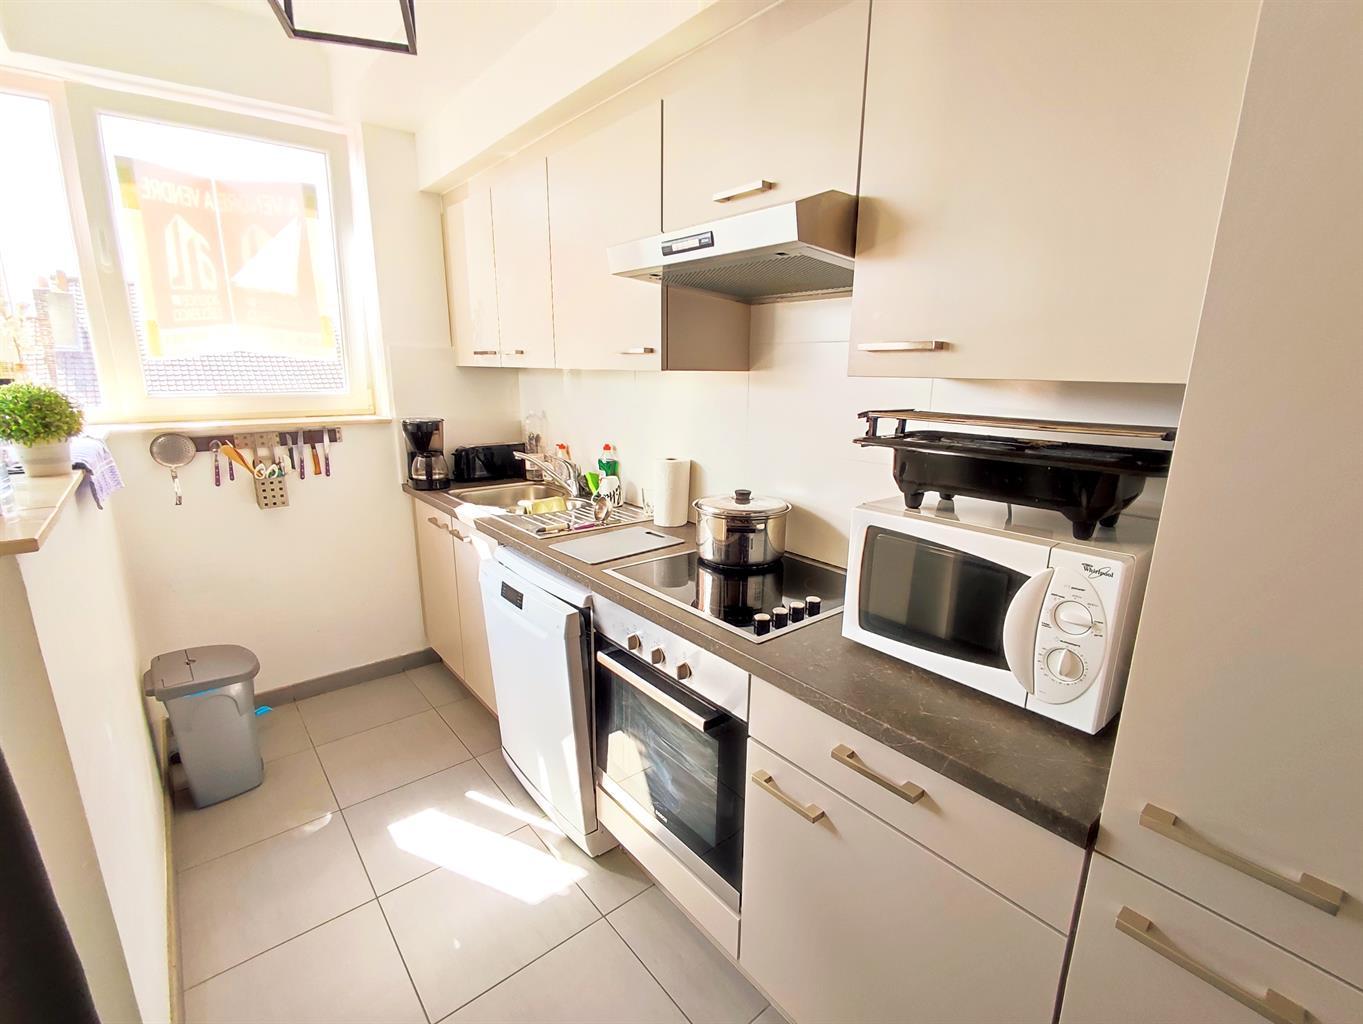 Appartement - Tournai - #4443089-1